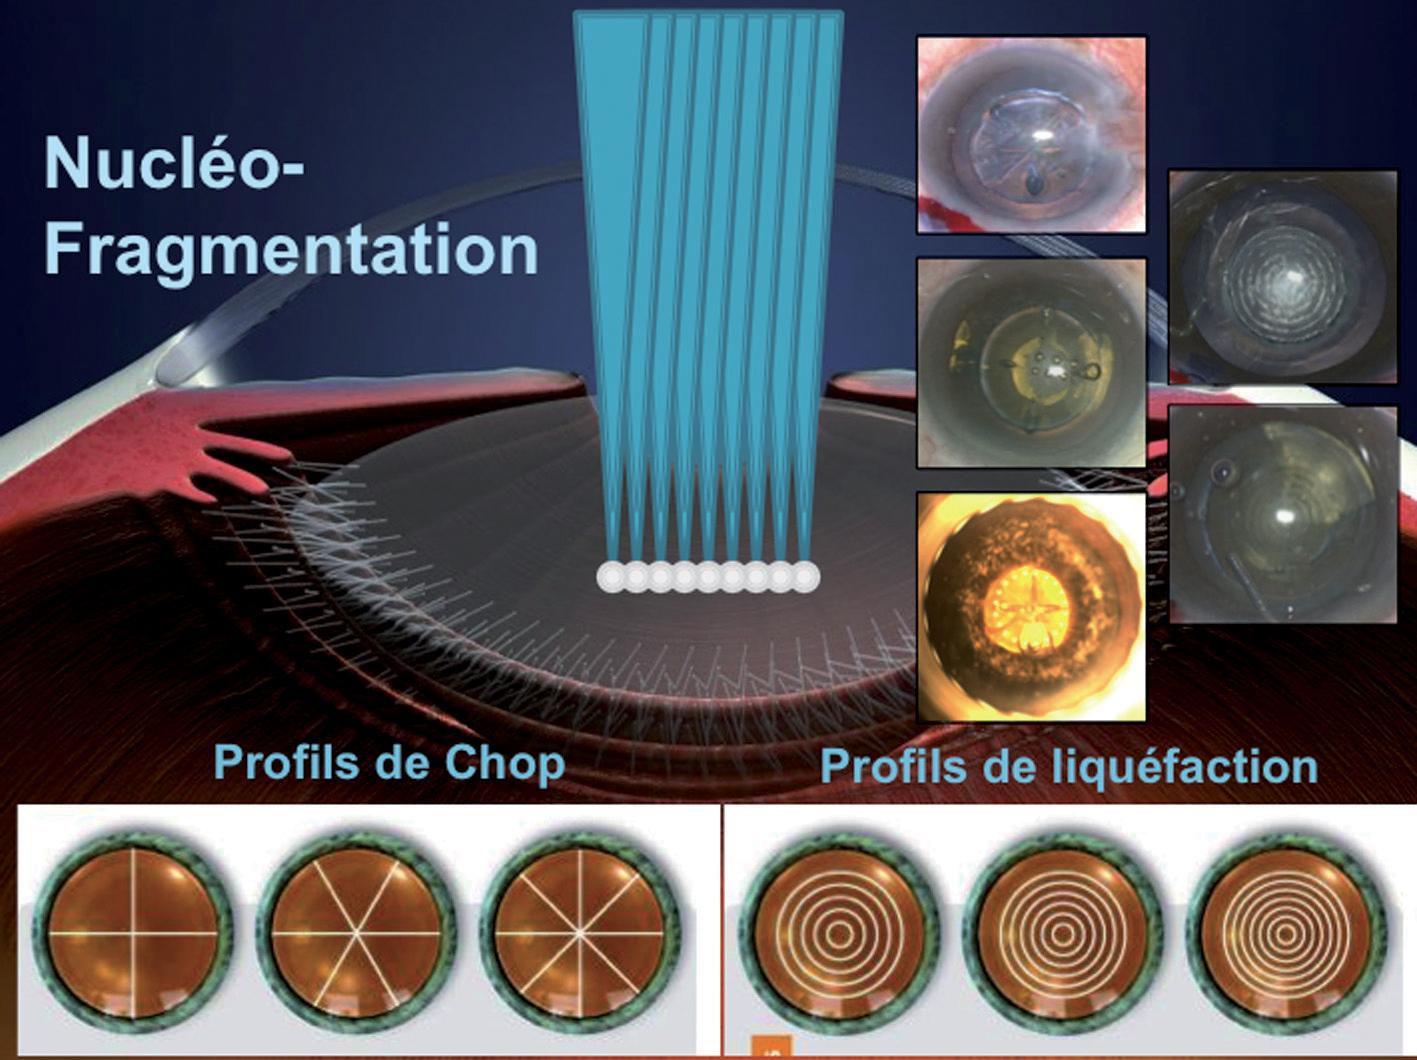 Nucléo-Fragmentation